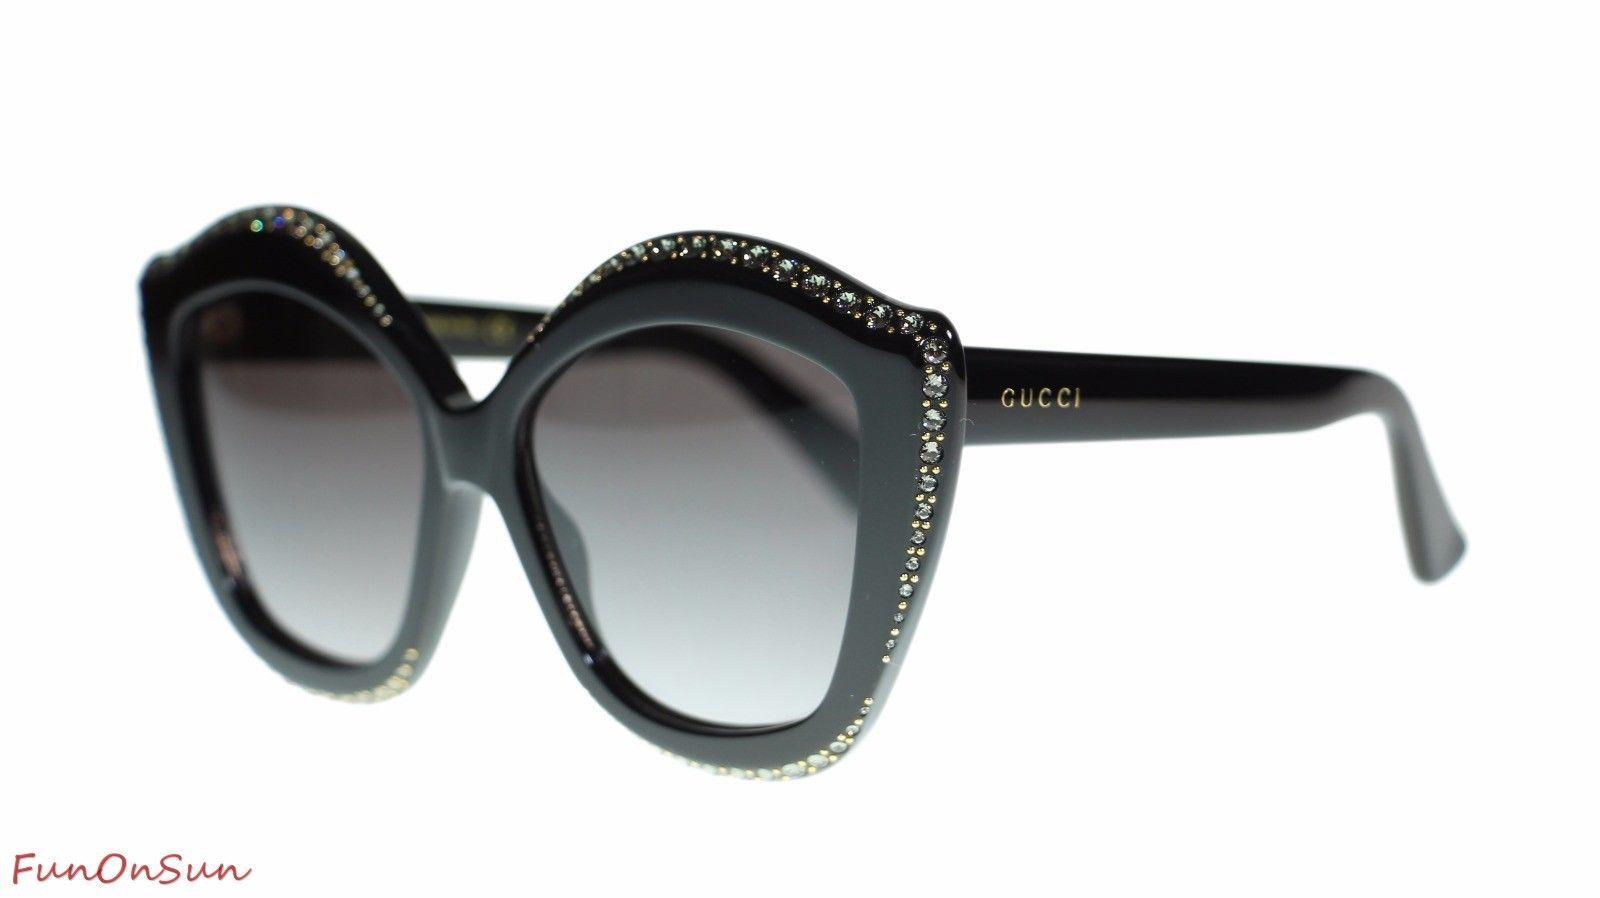 Gucci Women Designer Sunglasses GG0118S 001 Black/Grey Lens 53mm Authentic